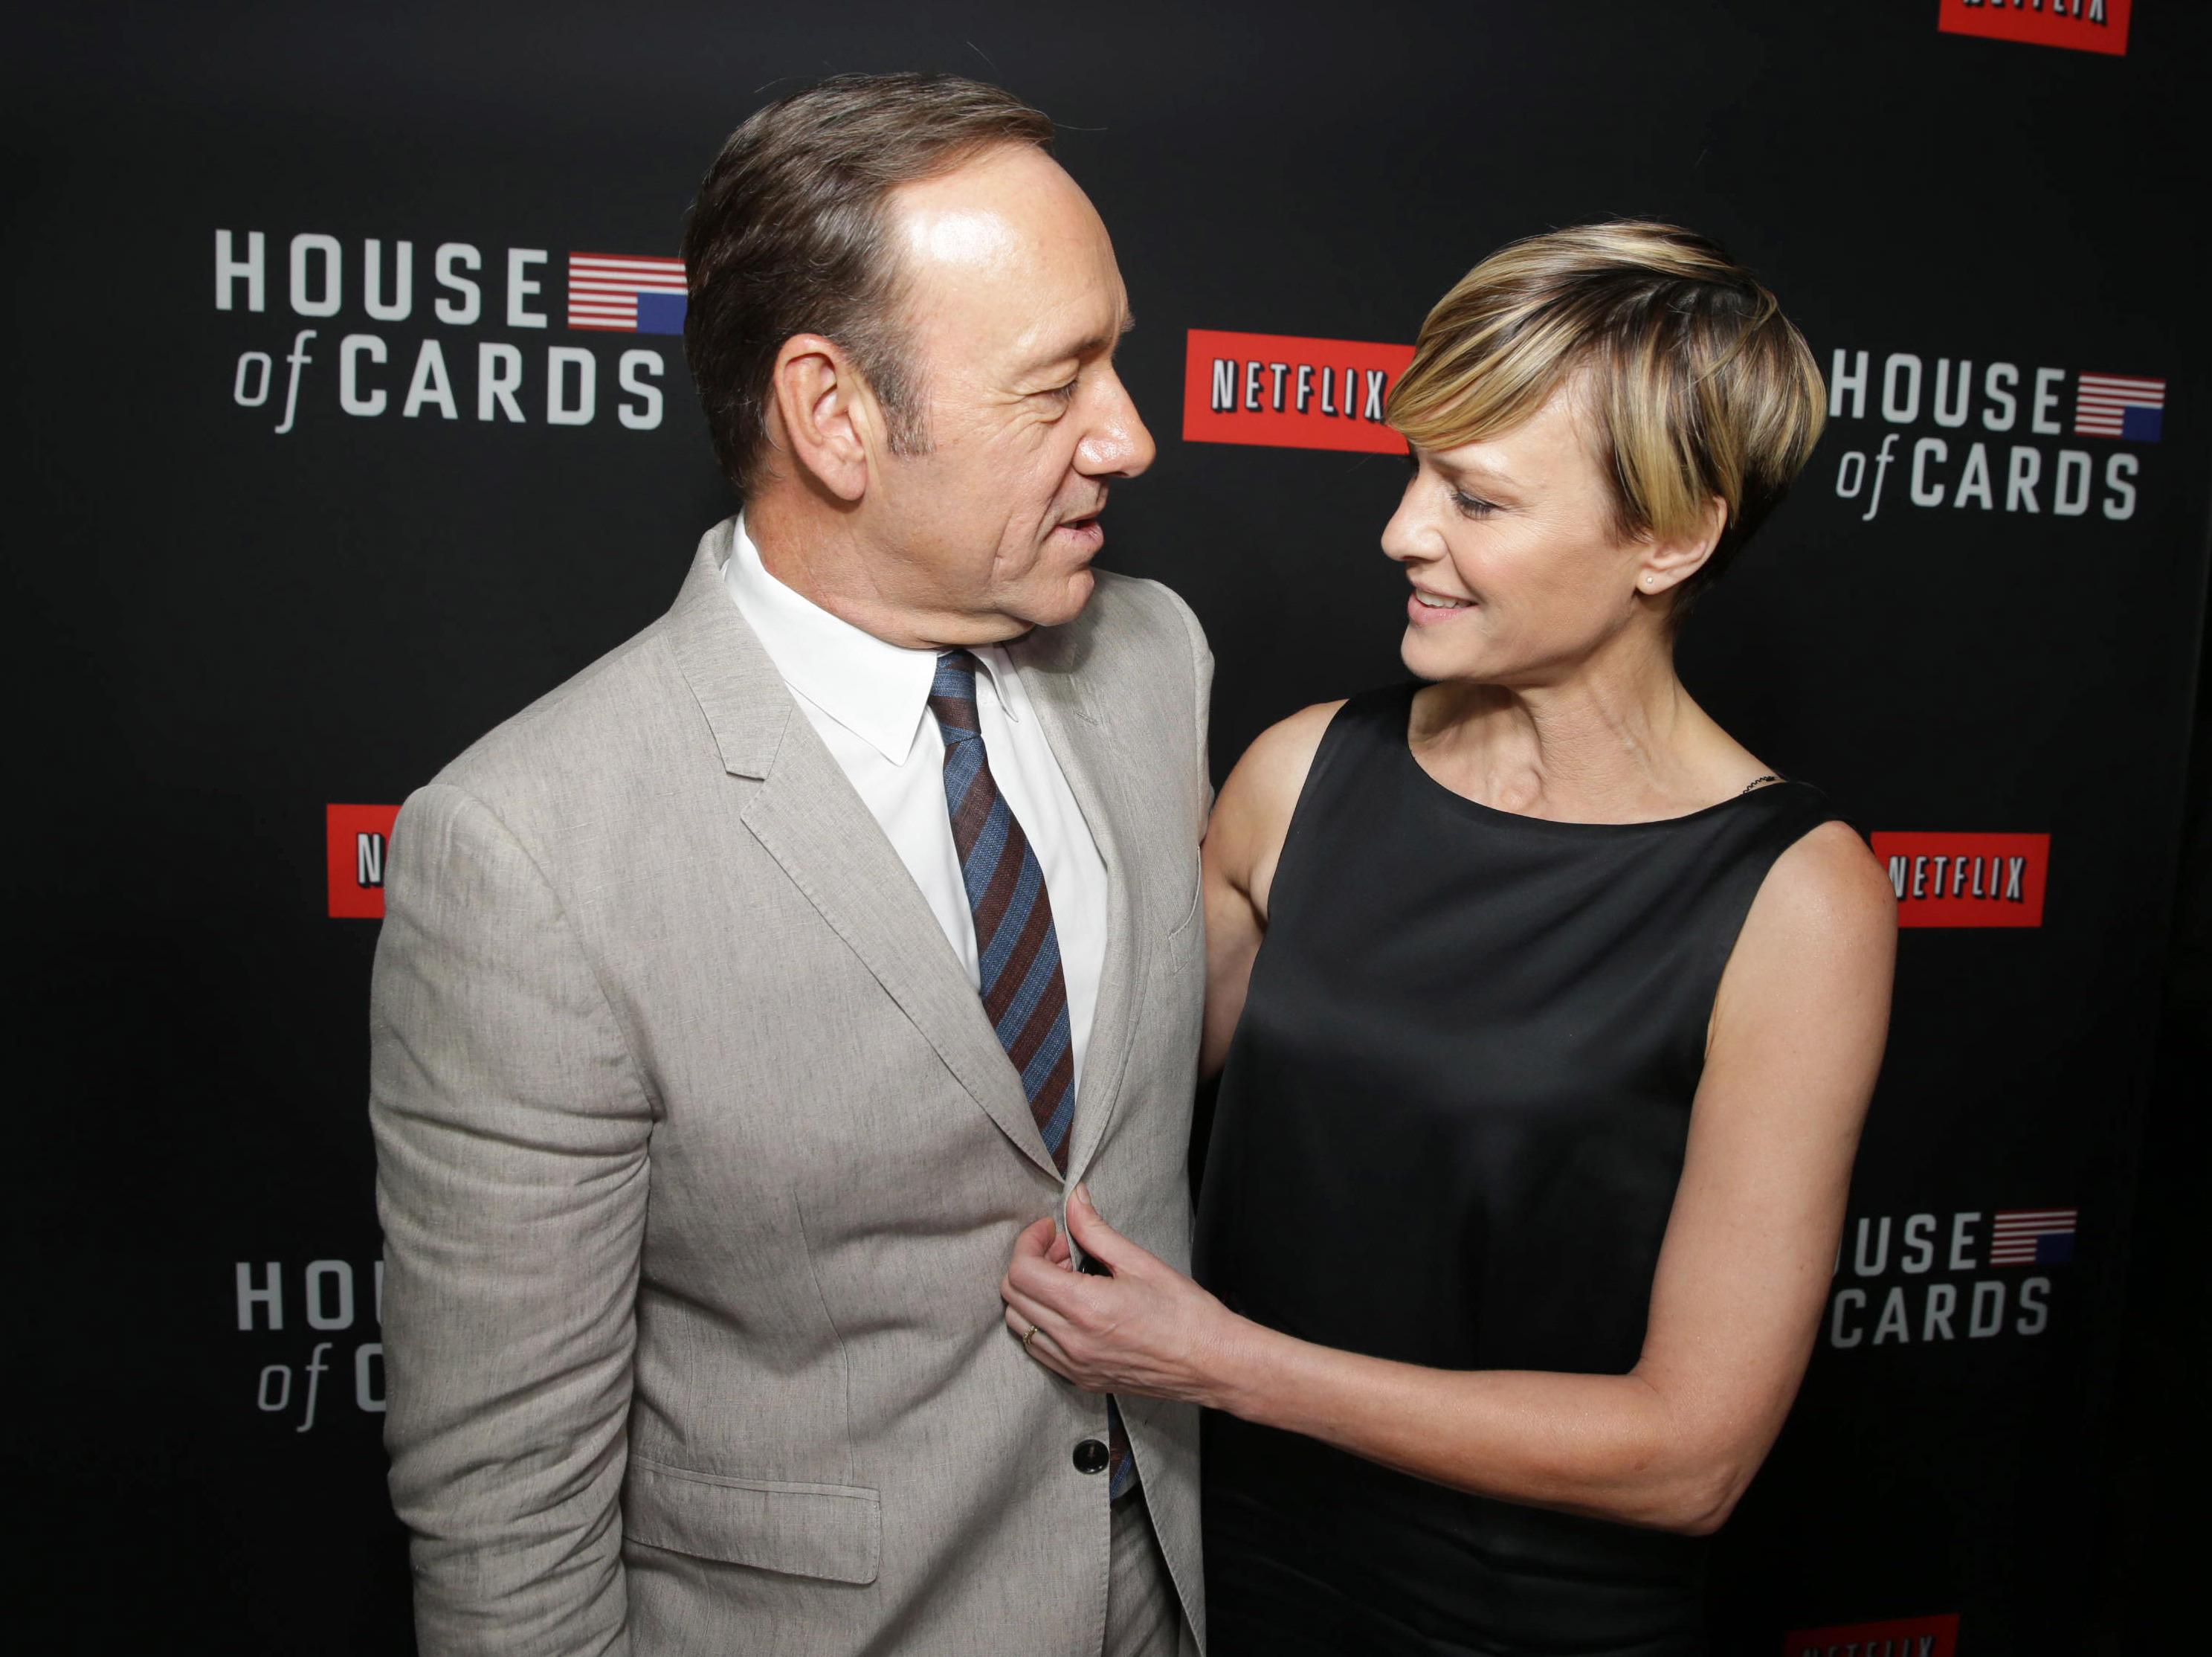 Netflix Says It Will Raise New Customer Subscription Rates